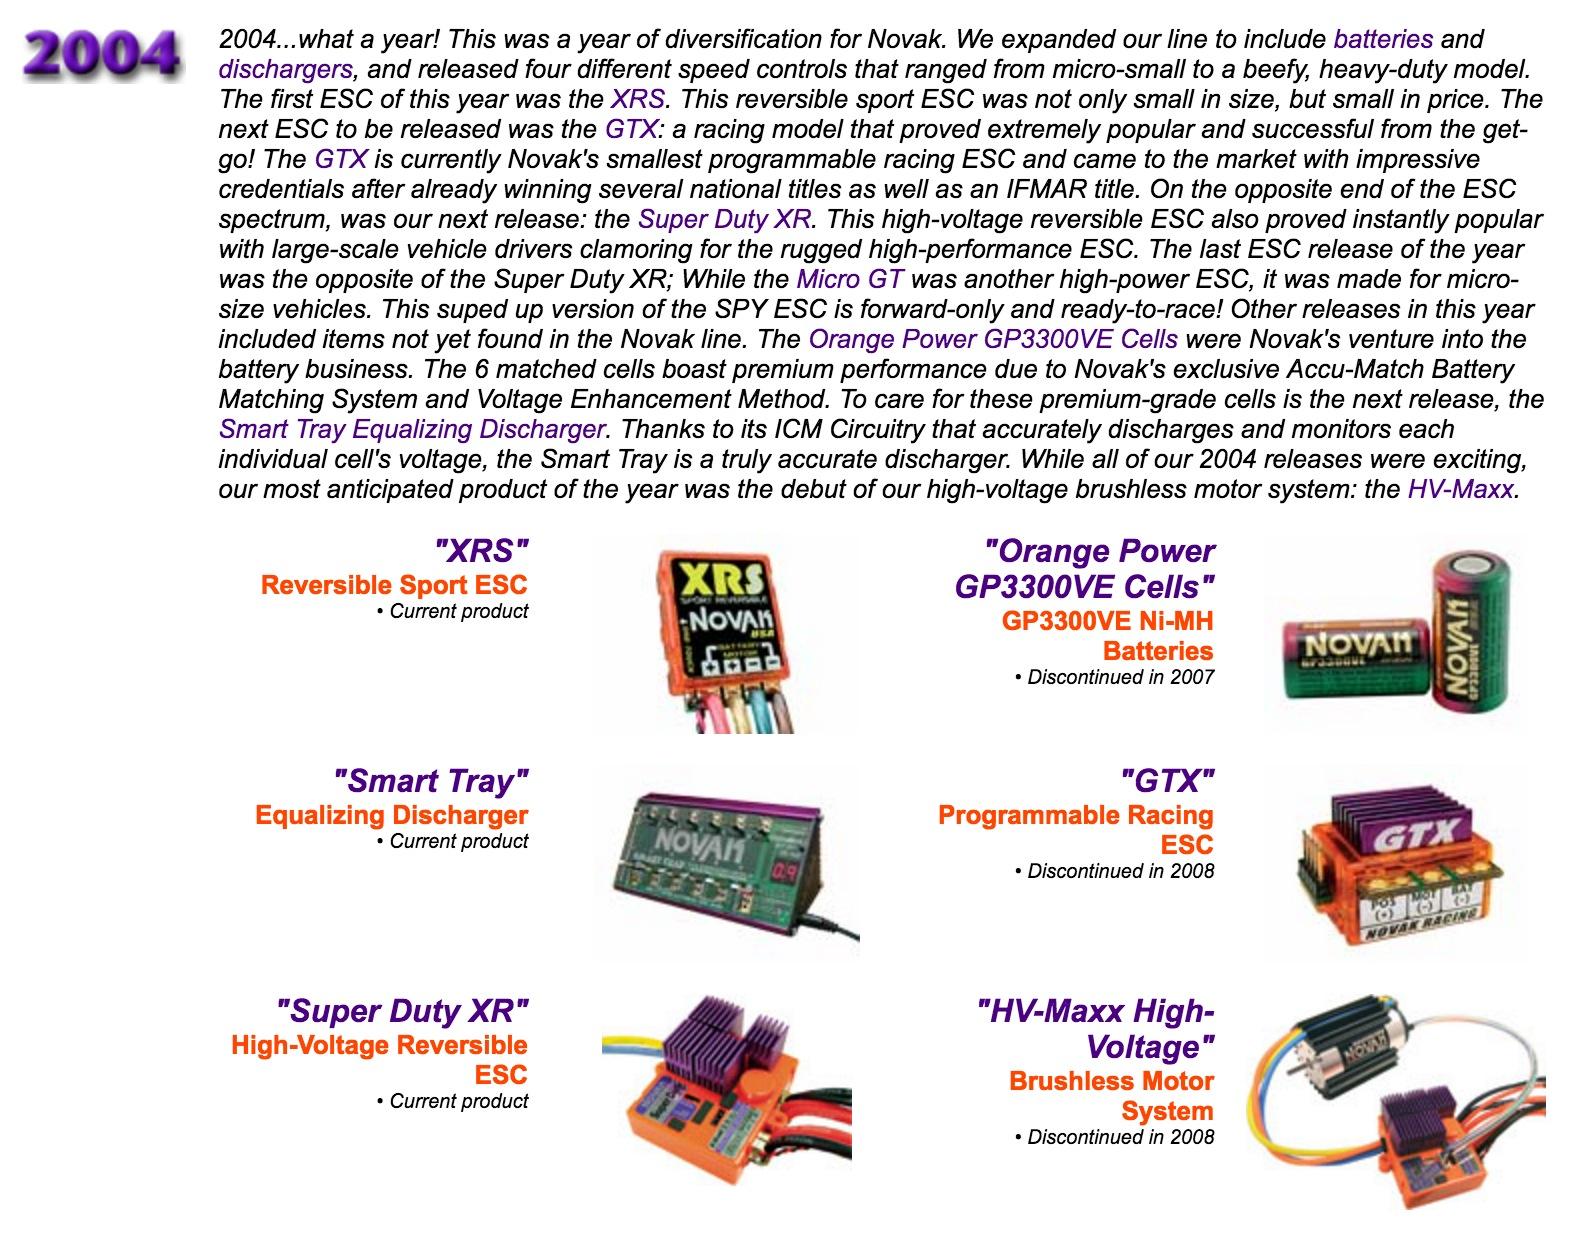 Ballistic Receiver Wiring Diagram Trusted Diagrams Brushless Motor Novak Esc Circuit Smart U2022 Electric Rc Car